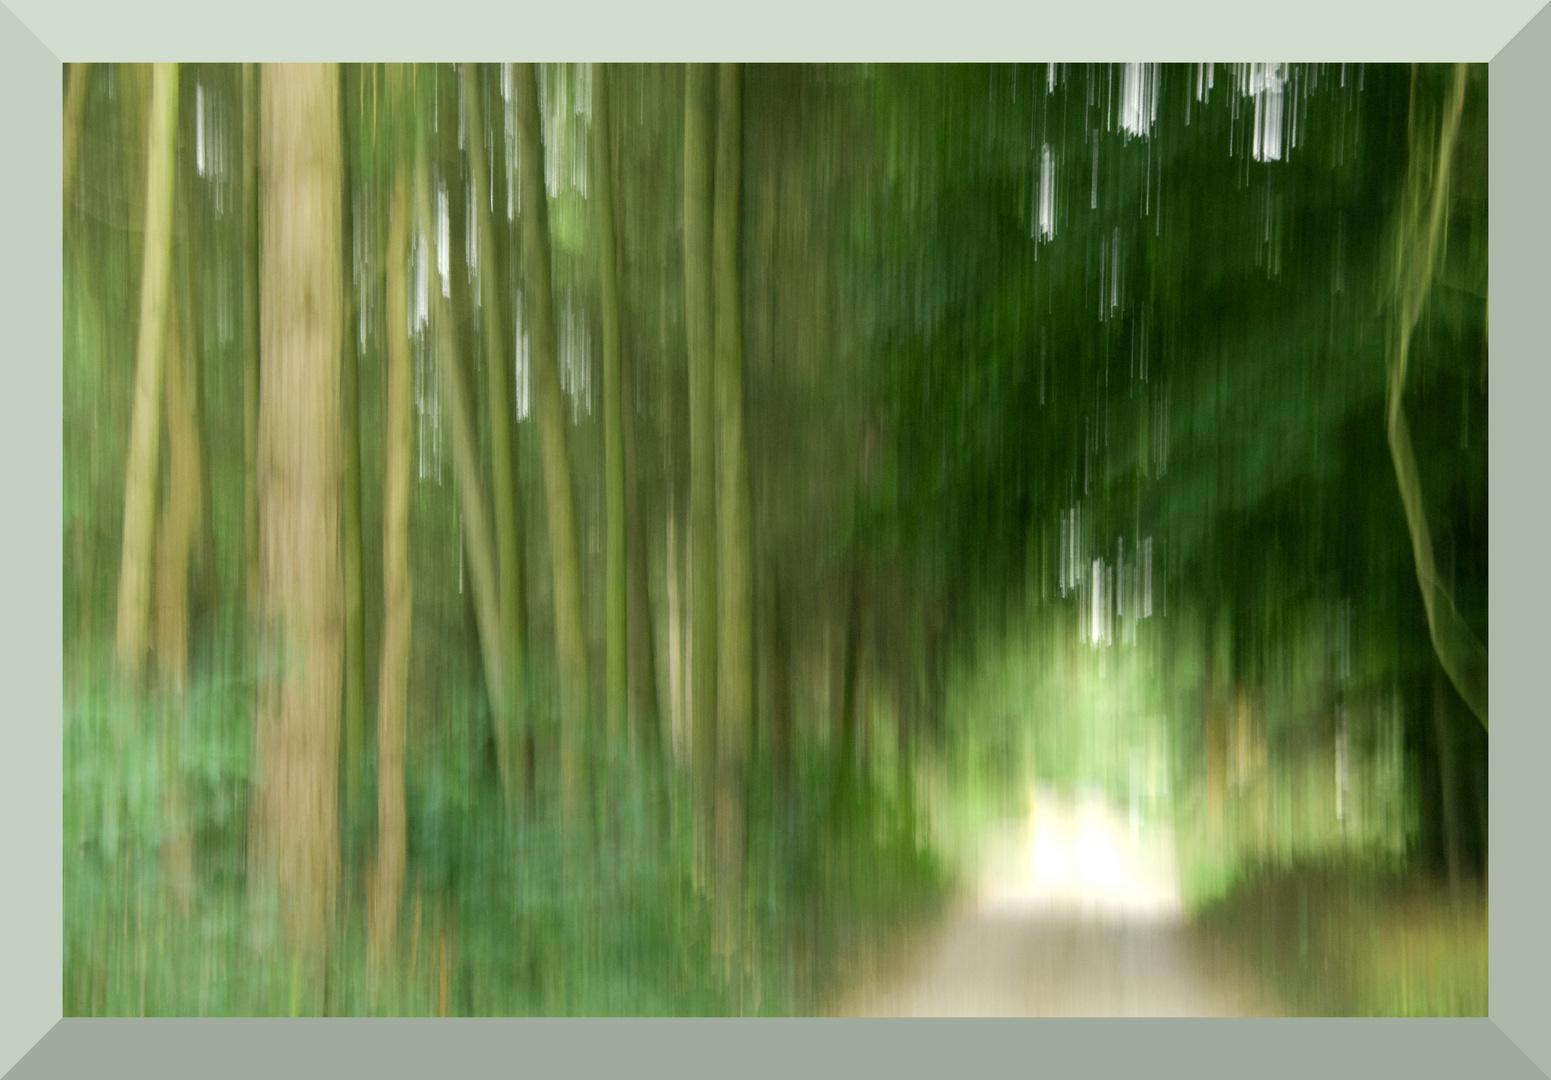 Spaziergang im Wald.